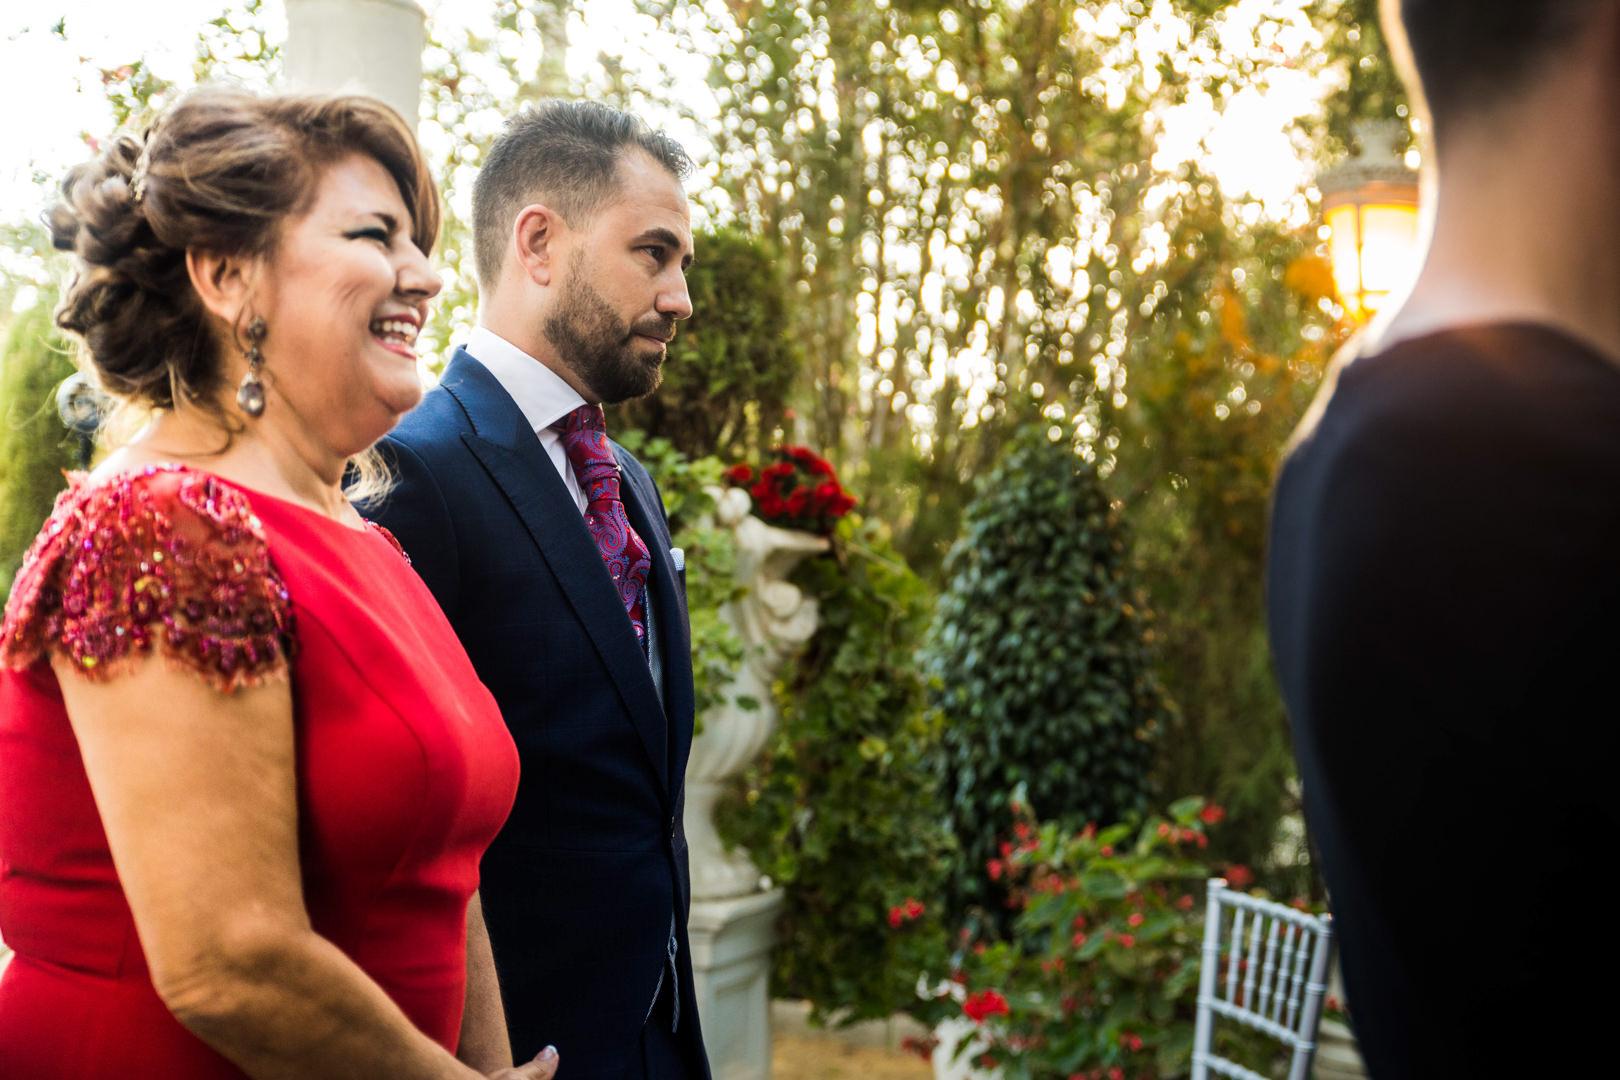 Boda-Irene-Marcos-Dos-Hermanas-Finca-Clotidle-engagement-Rafael-Torres-fotografo-bodas-sevilla-madrid-barcelona-wedding-photographer--19.jpg